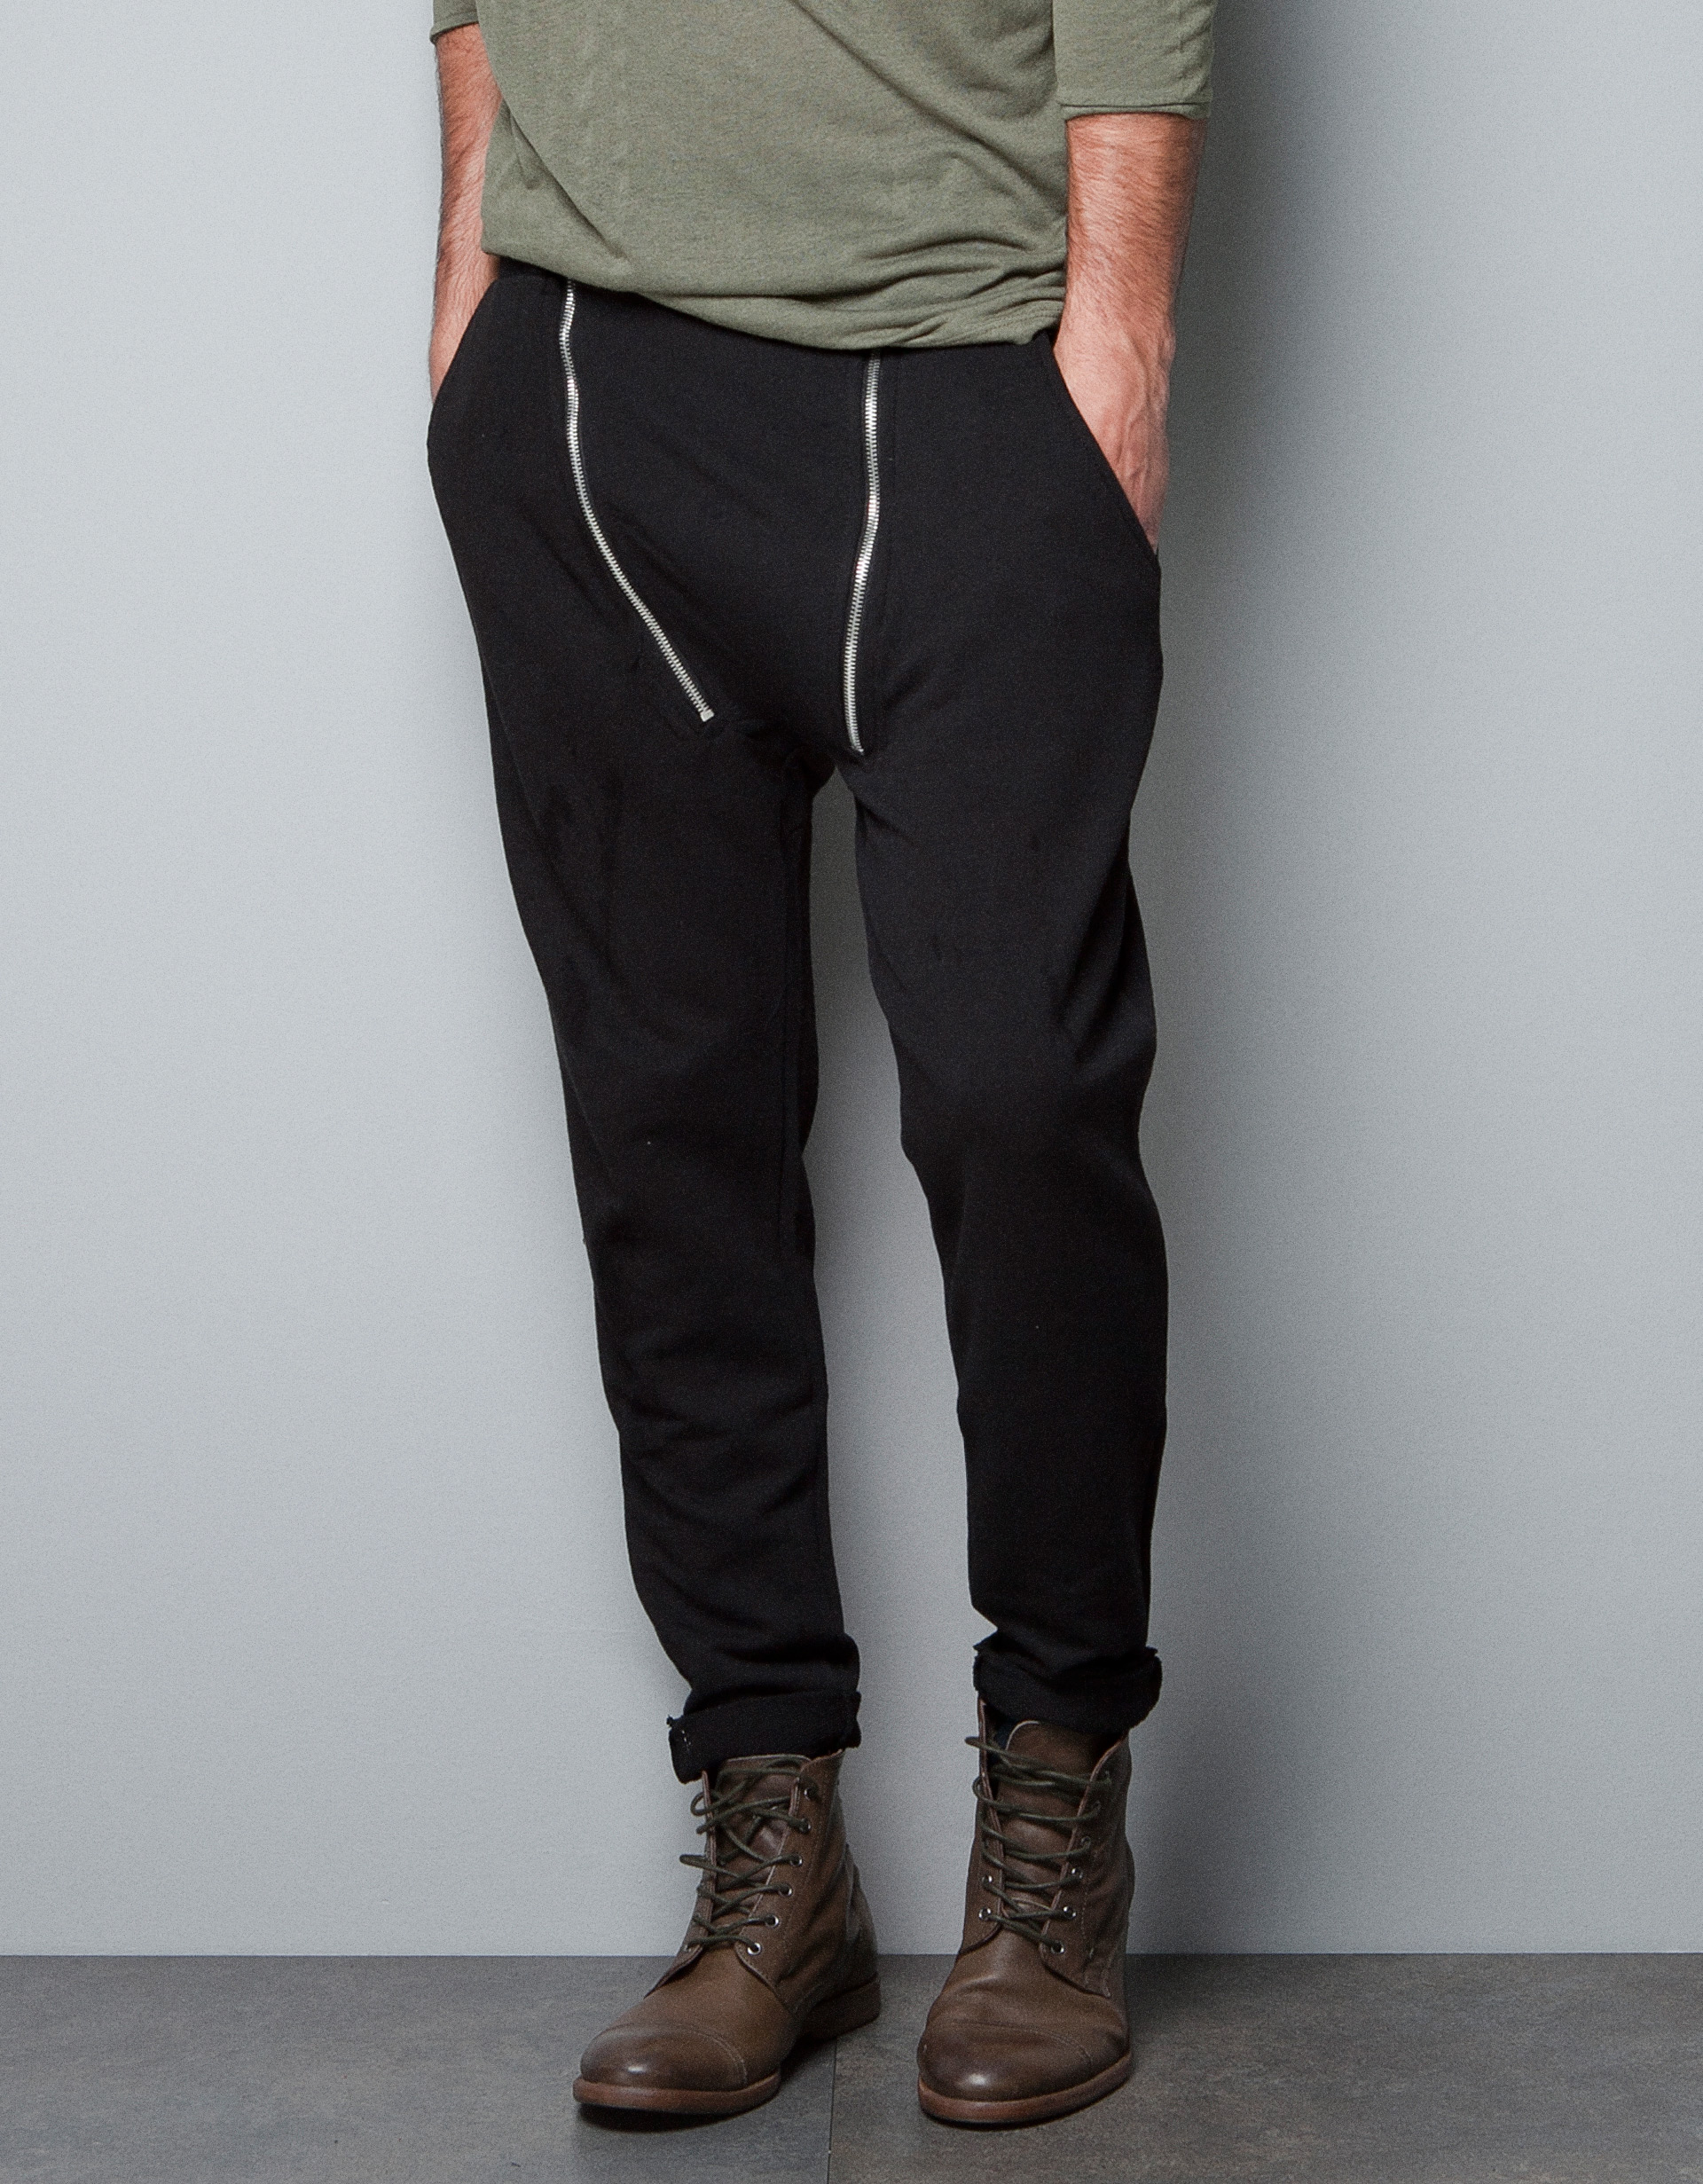 Zara Trousers with Zips in Black for Men | Lyst